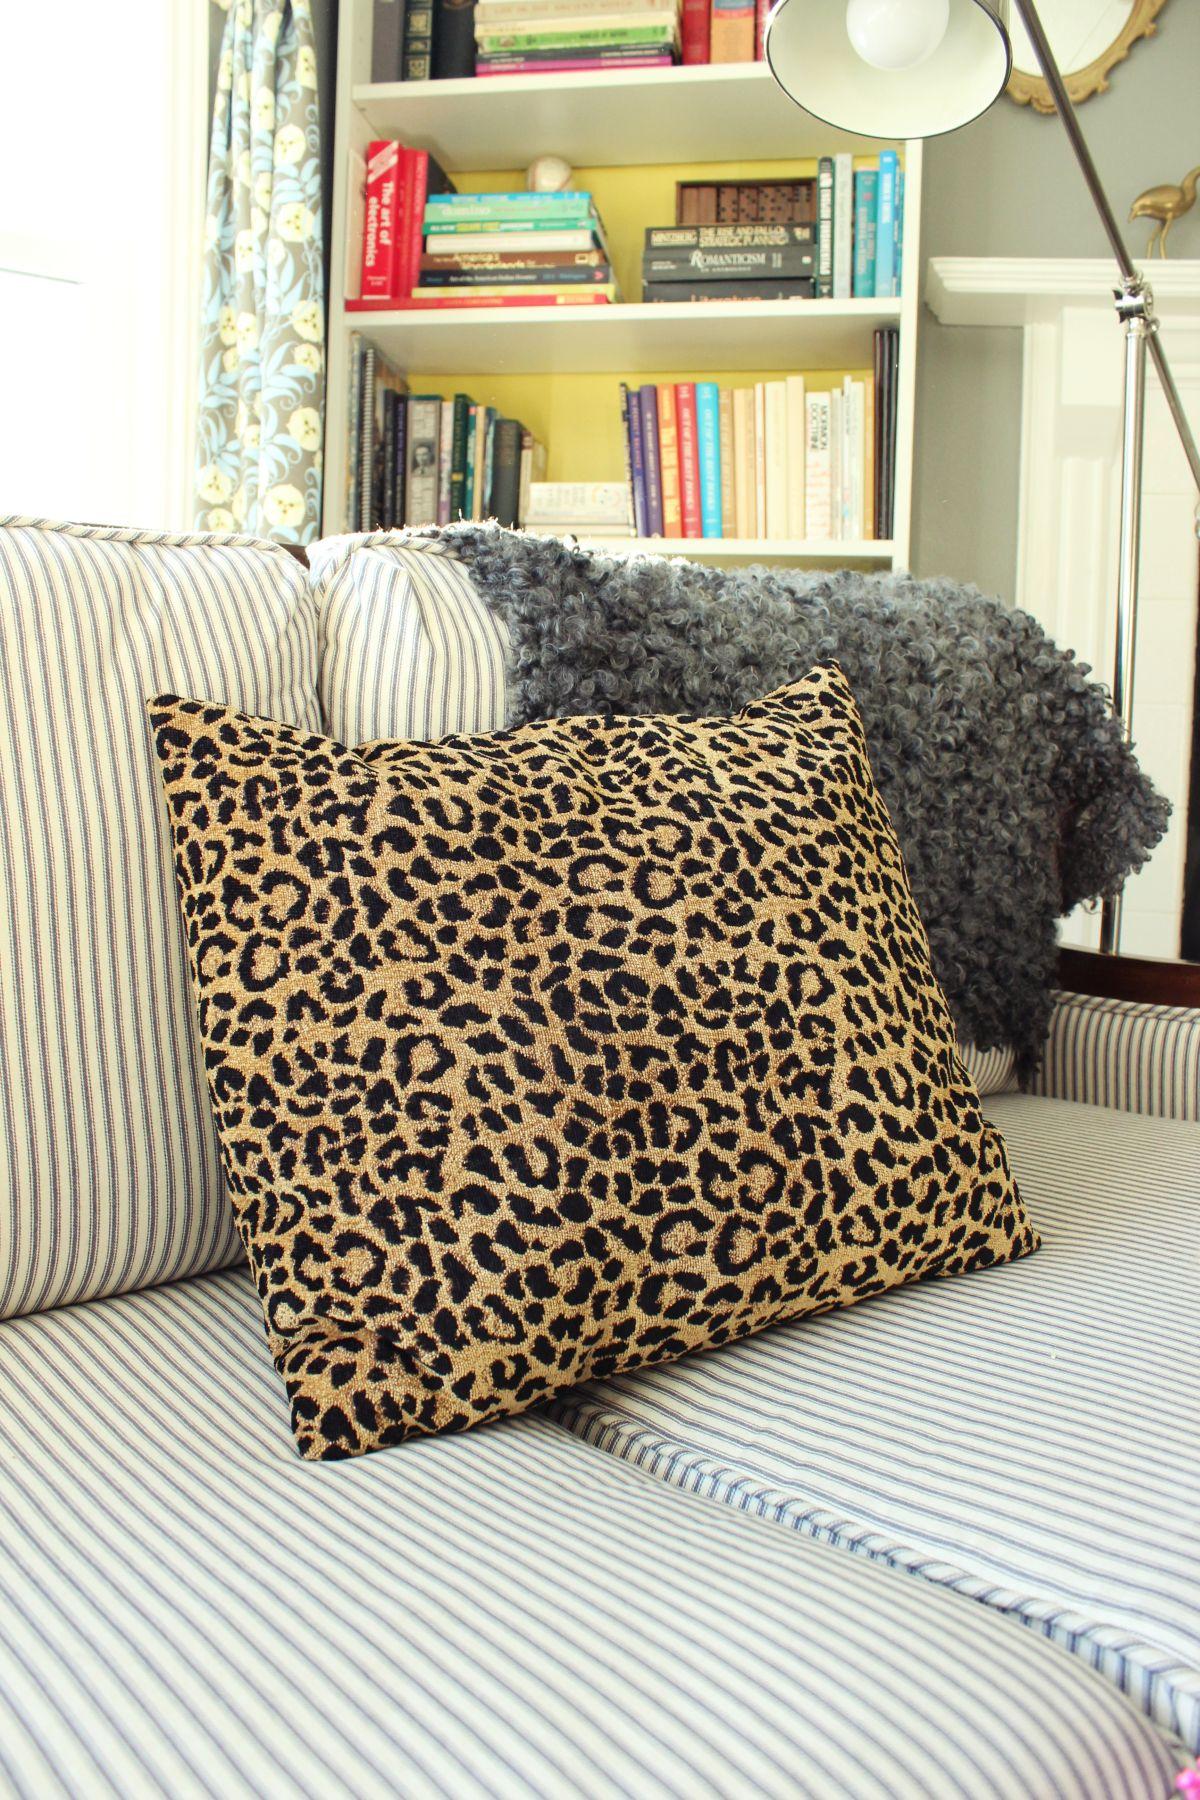 15-Minute Envelope Pillow Tutorial